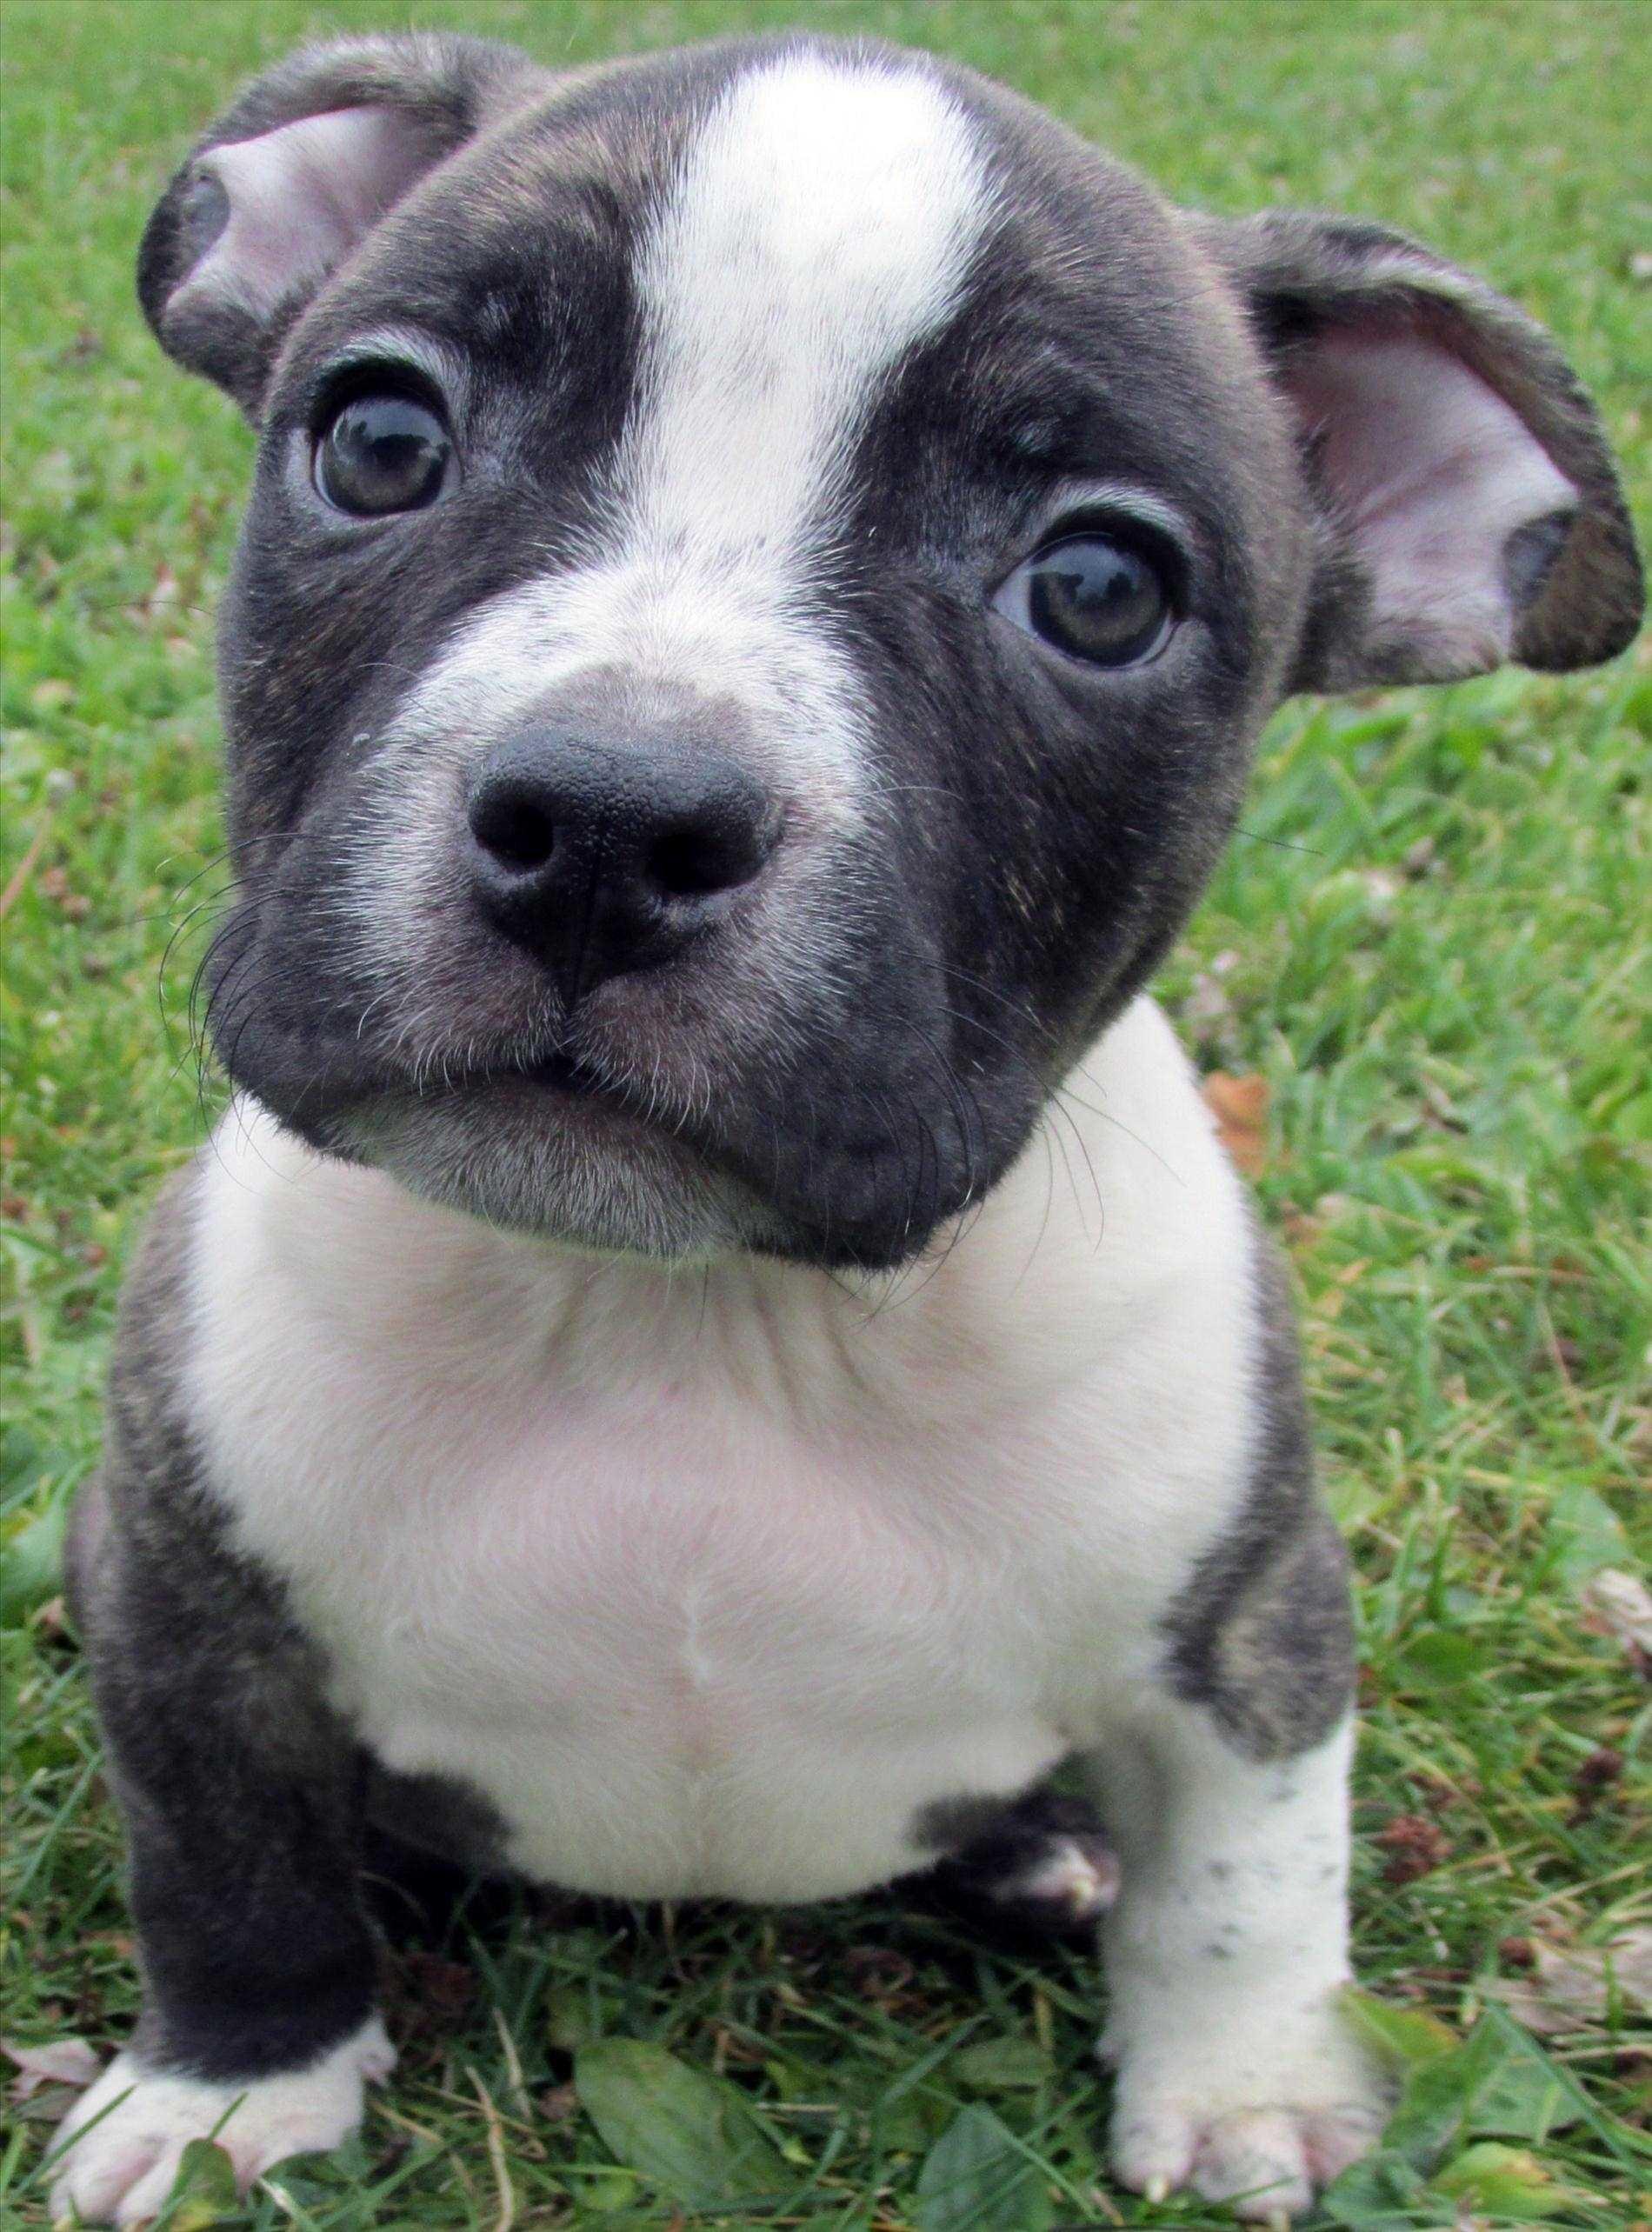 Pitbulls With Blue Eyes Pitbull Puppies For Sale Red Wallpaper Hd Desktop  Pitbull Gray Baby Pitbulls